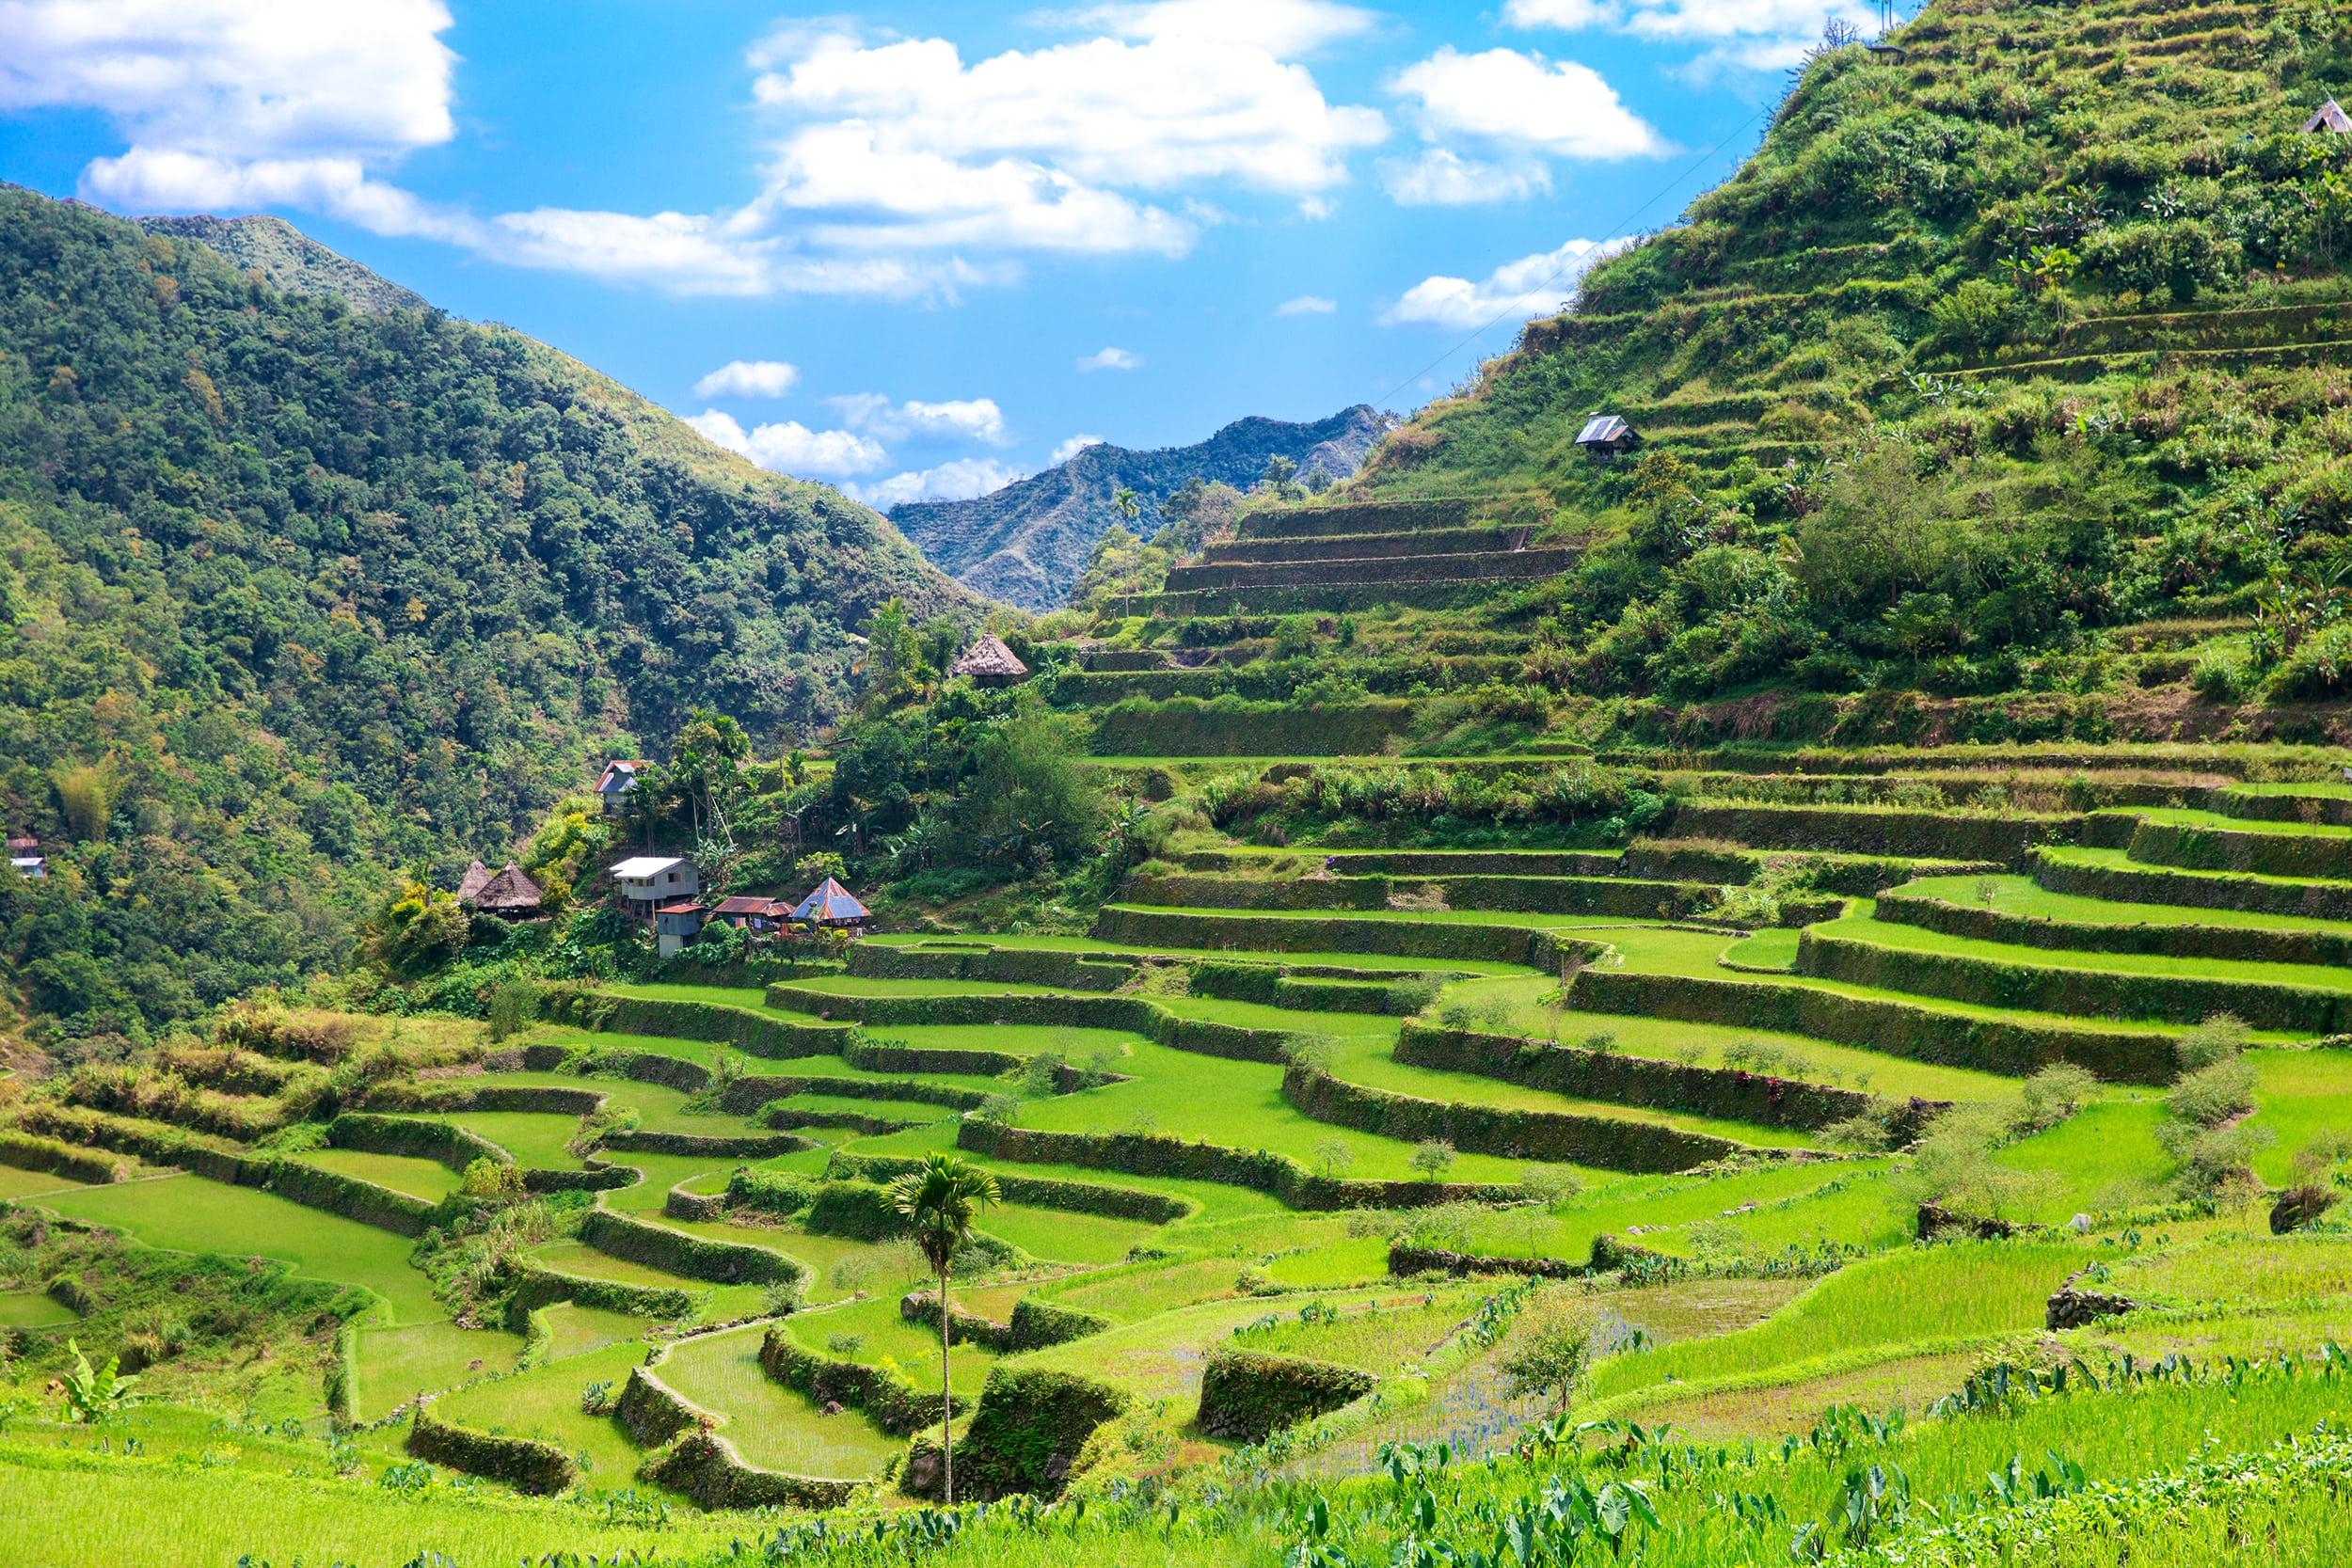 Breathtaking view of Batad Rice Terraces